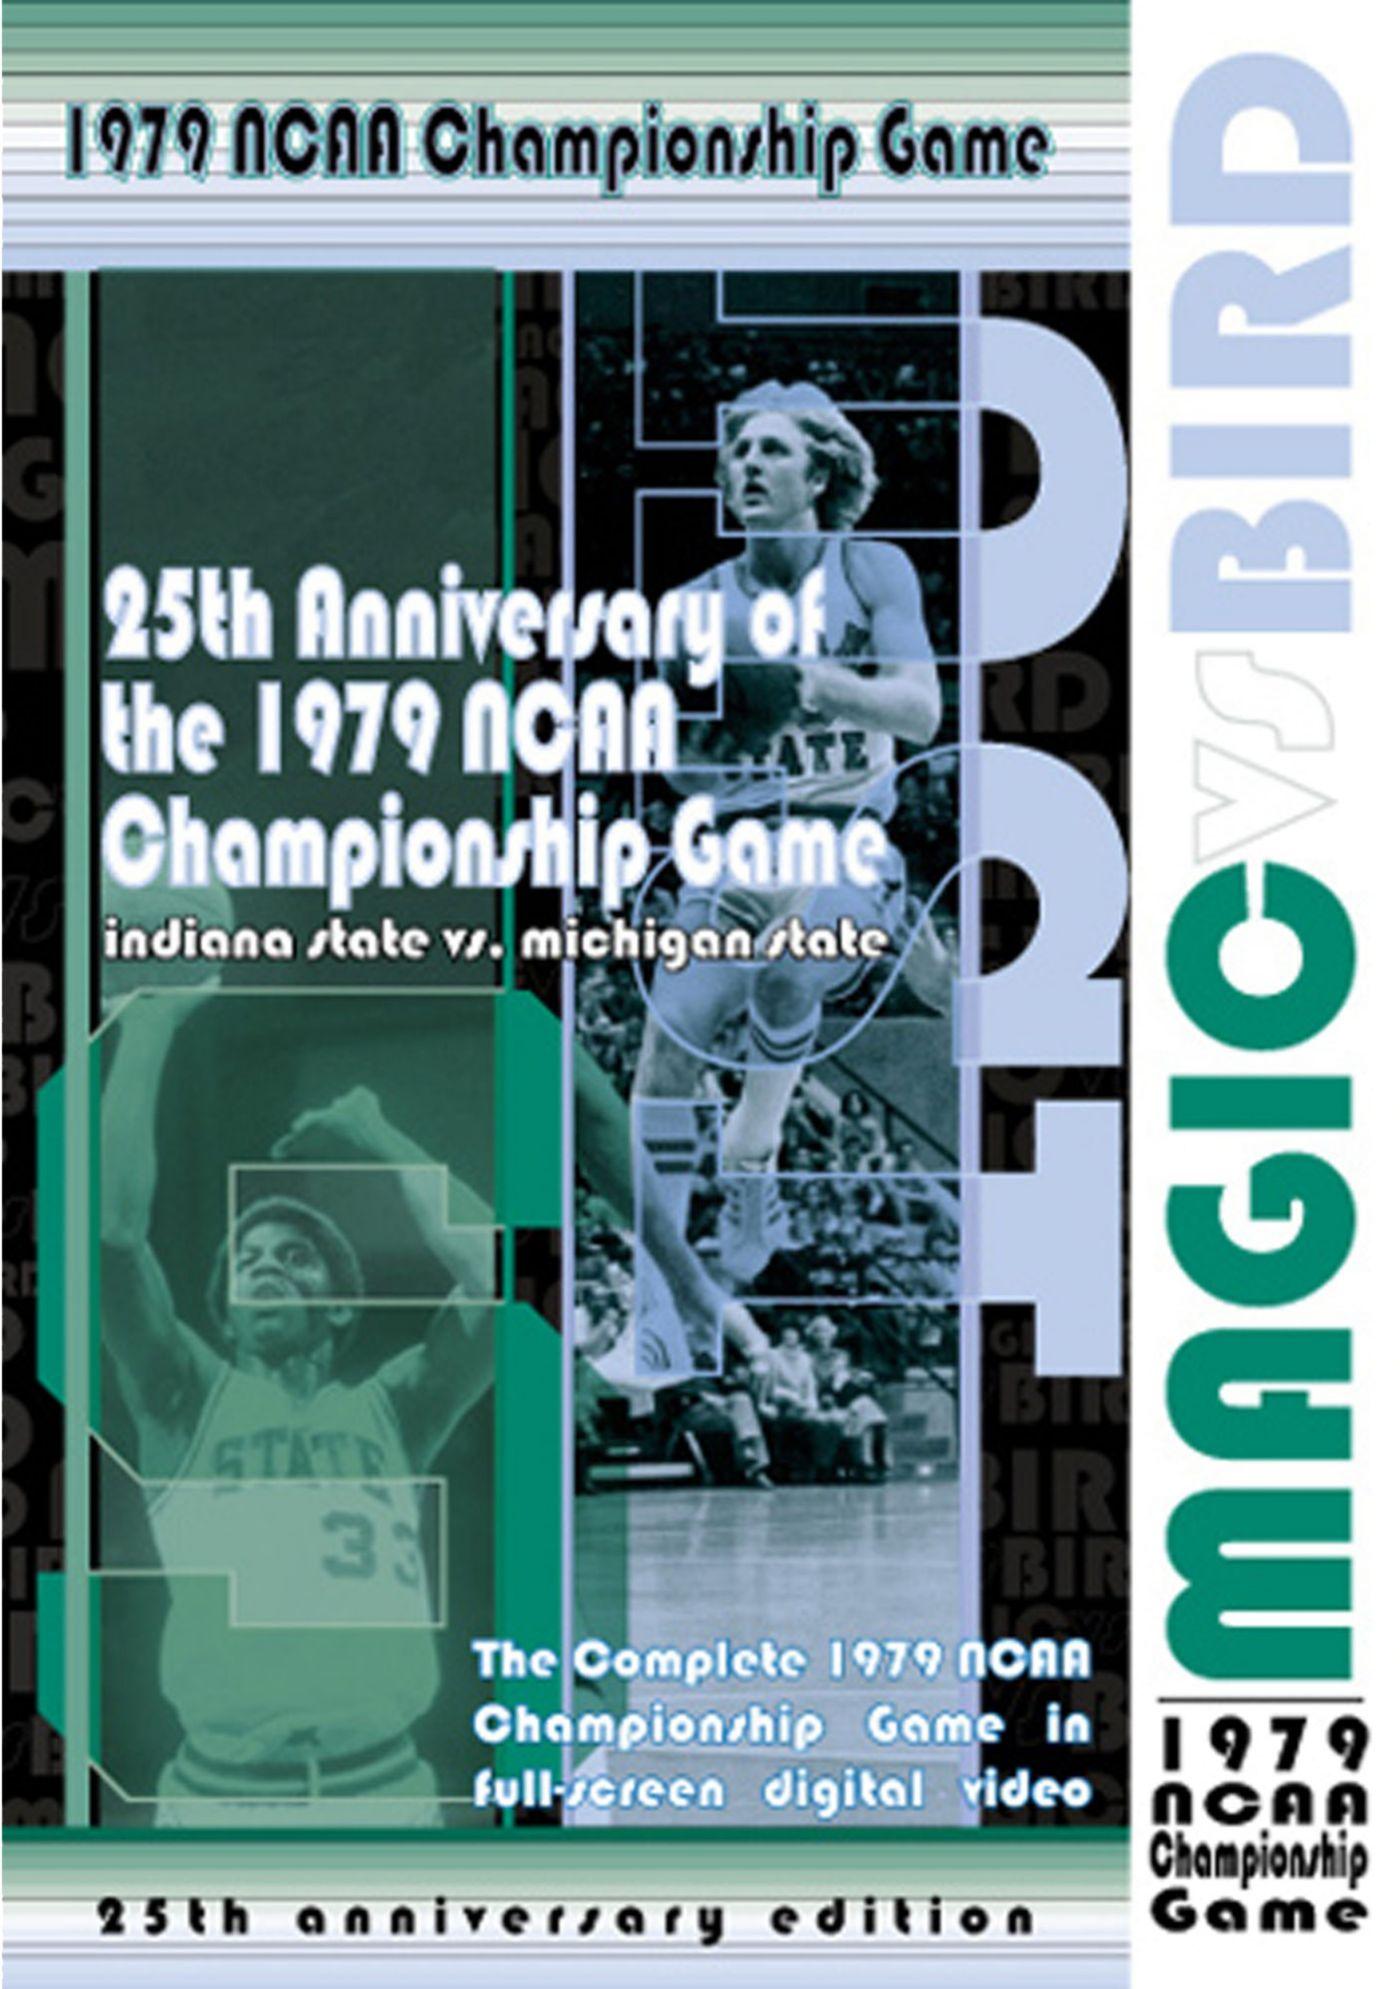 1979 Indiana State vs Michigan State - Magic vs. Bird DVD